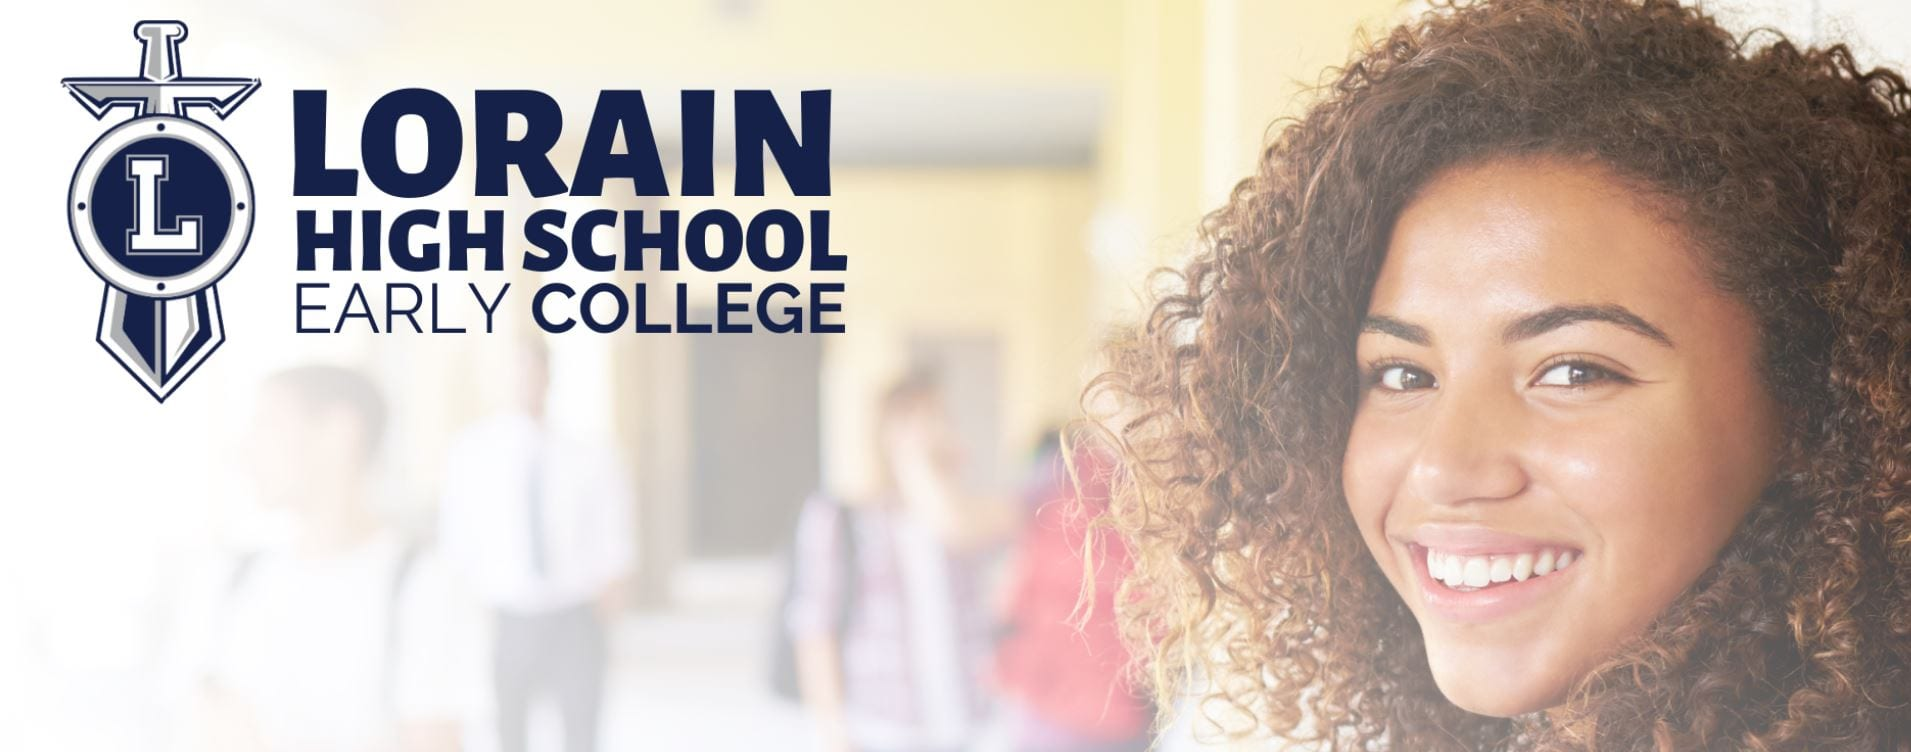 Lorain High School Early College Logo